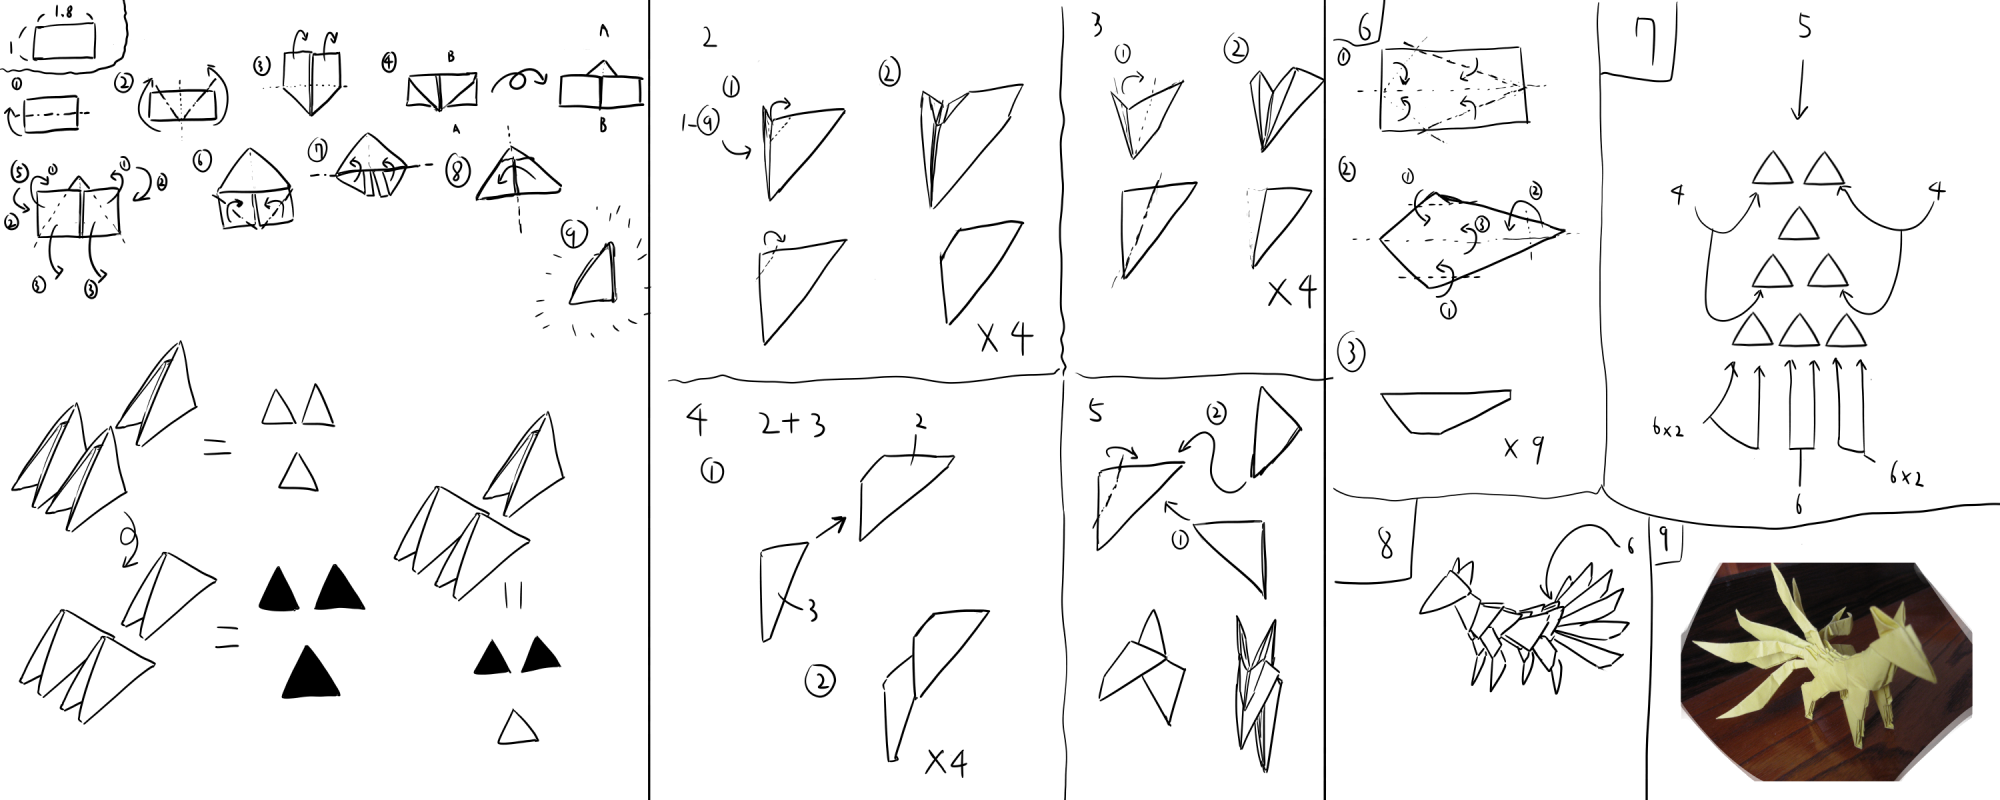 small resolution of 3d origami nine tailed fox how to build by kumazaza deviantart com3d origami nine tailed fox